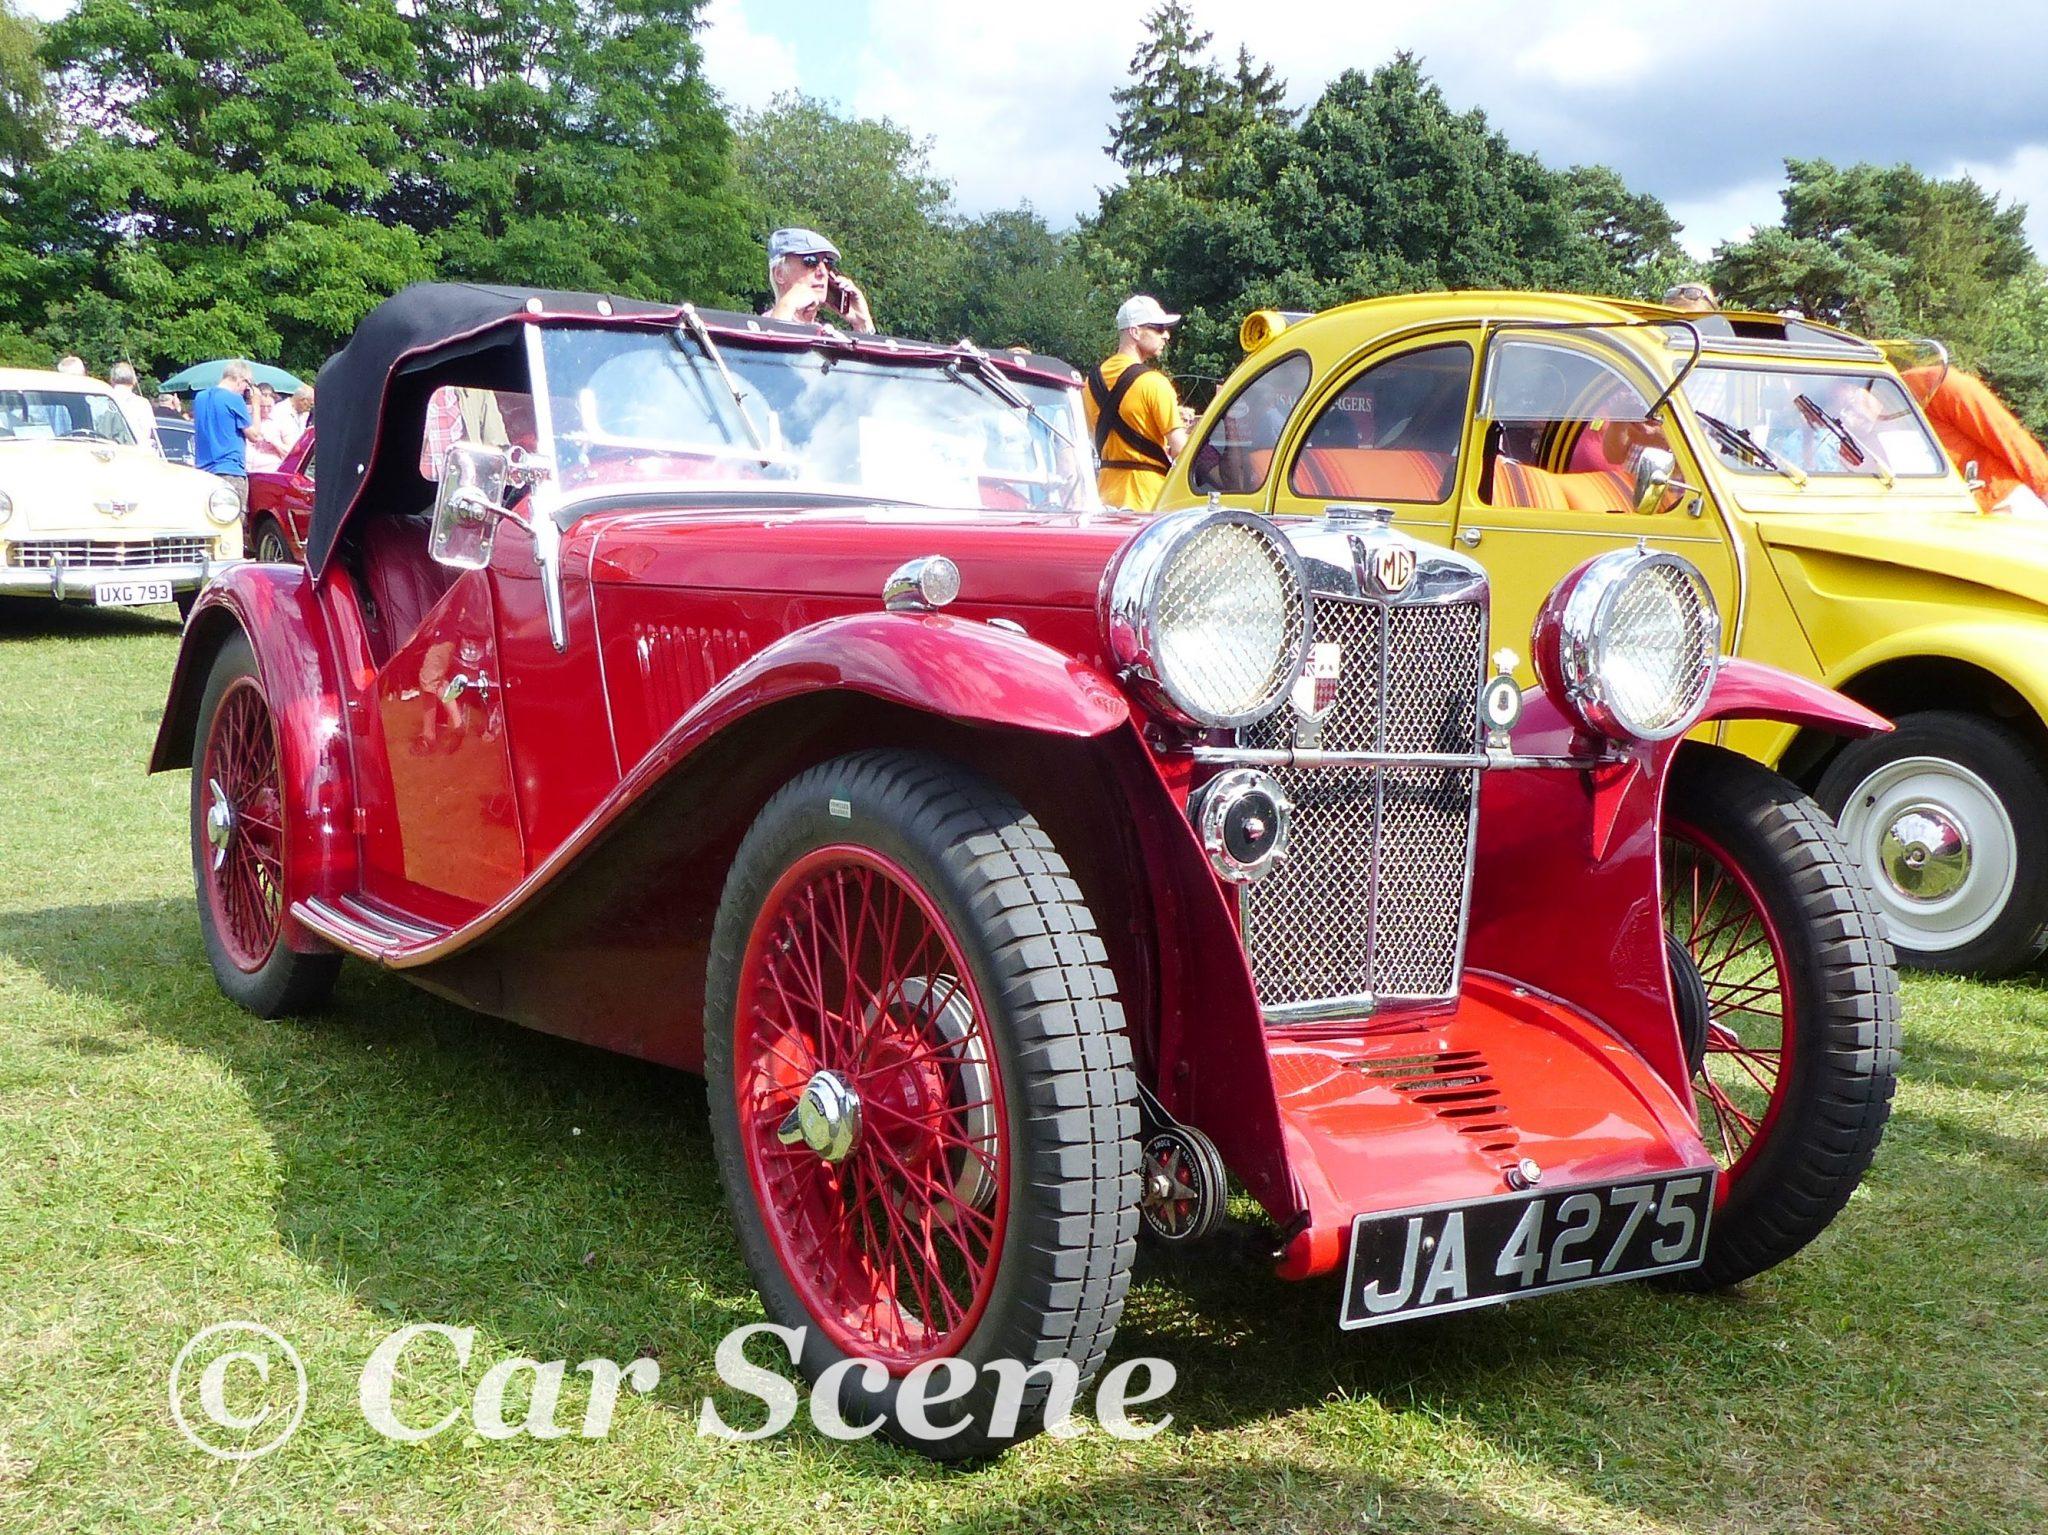 1934 MG J2 front three quarters view